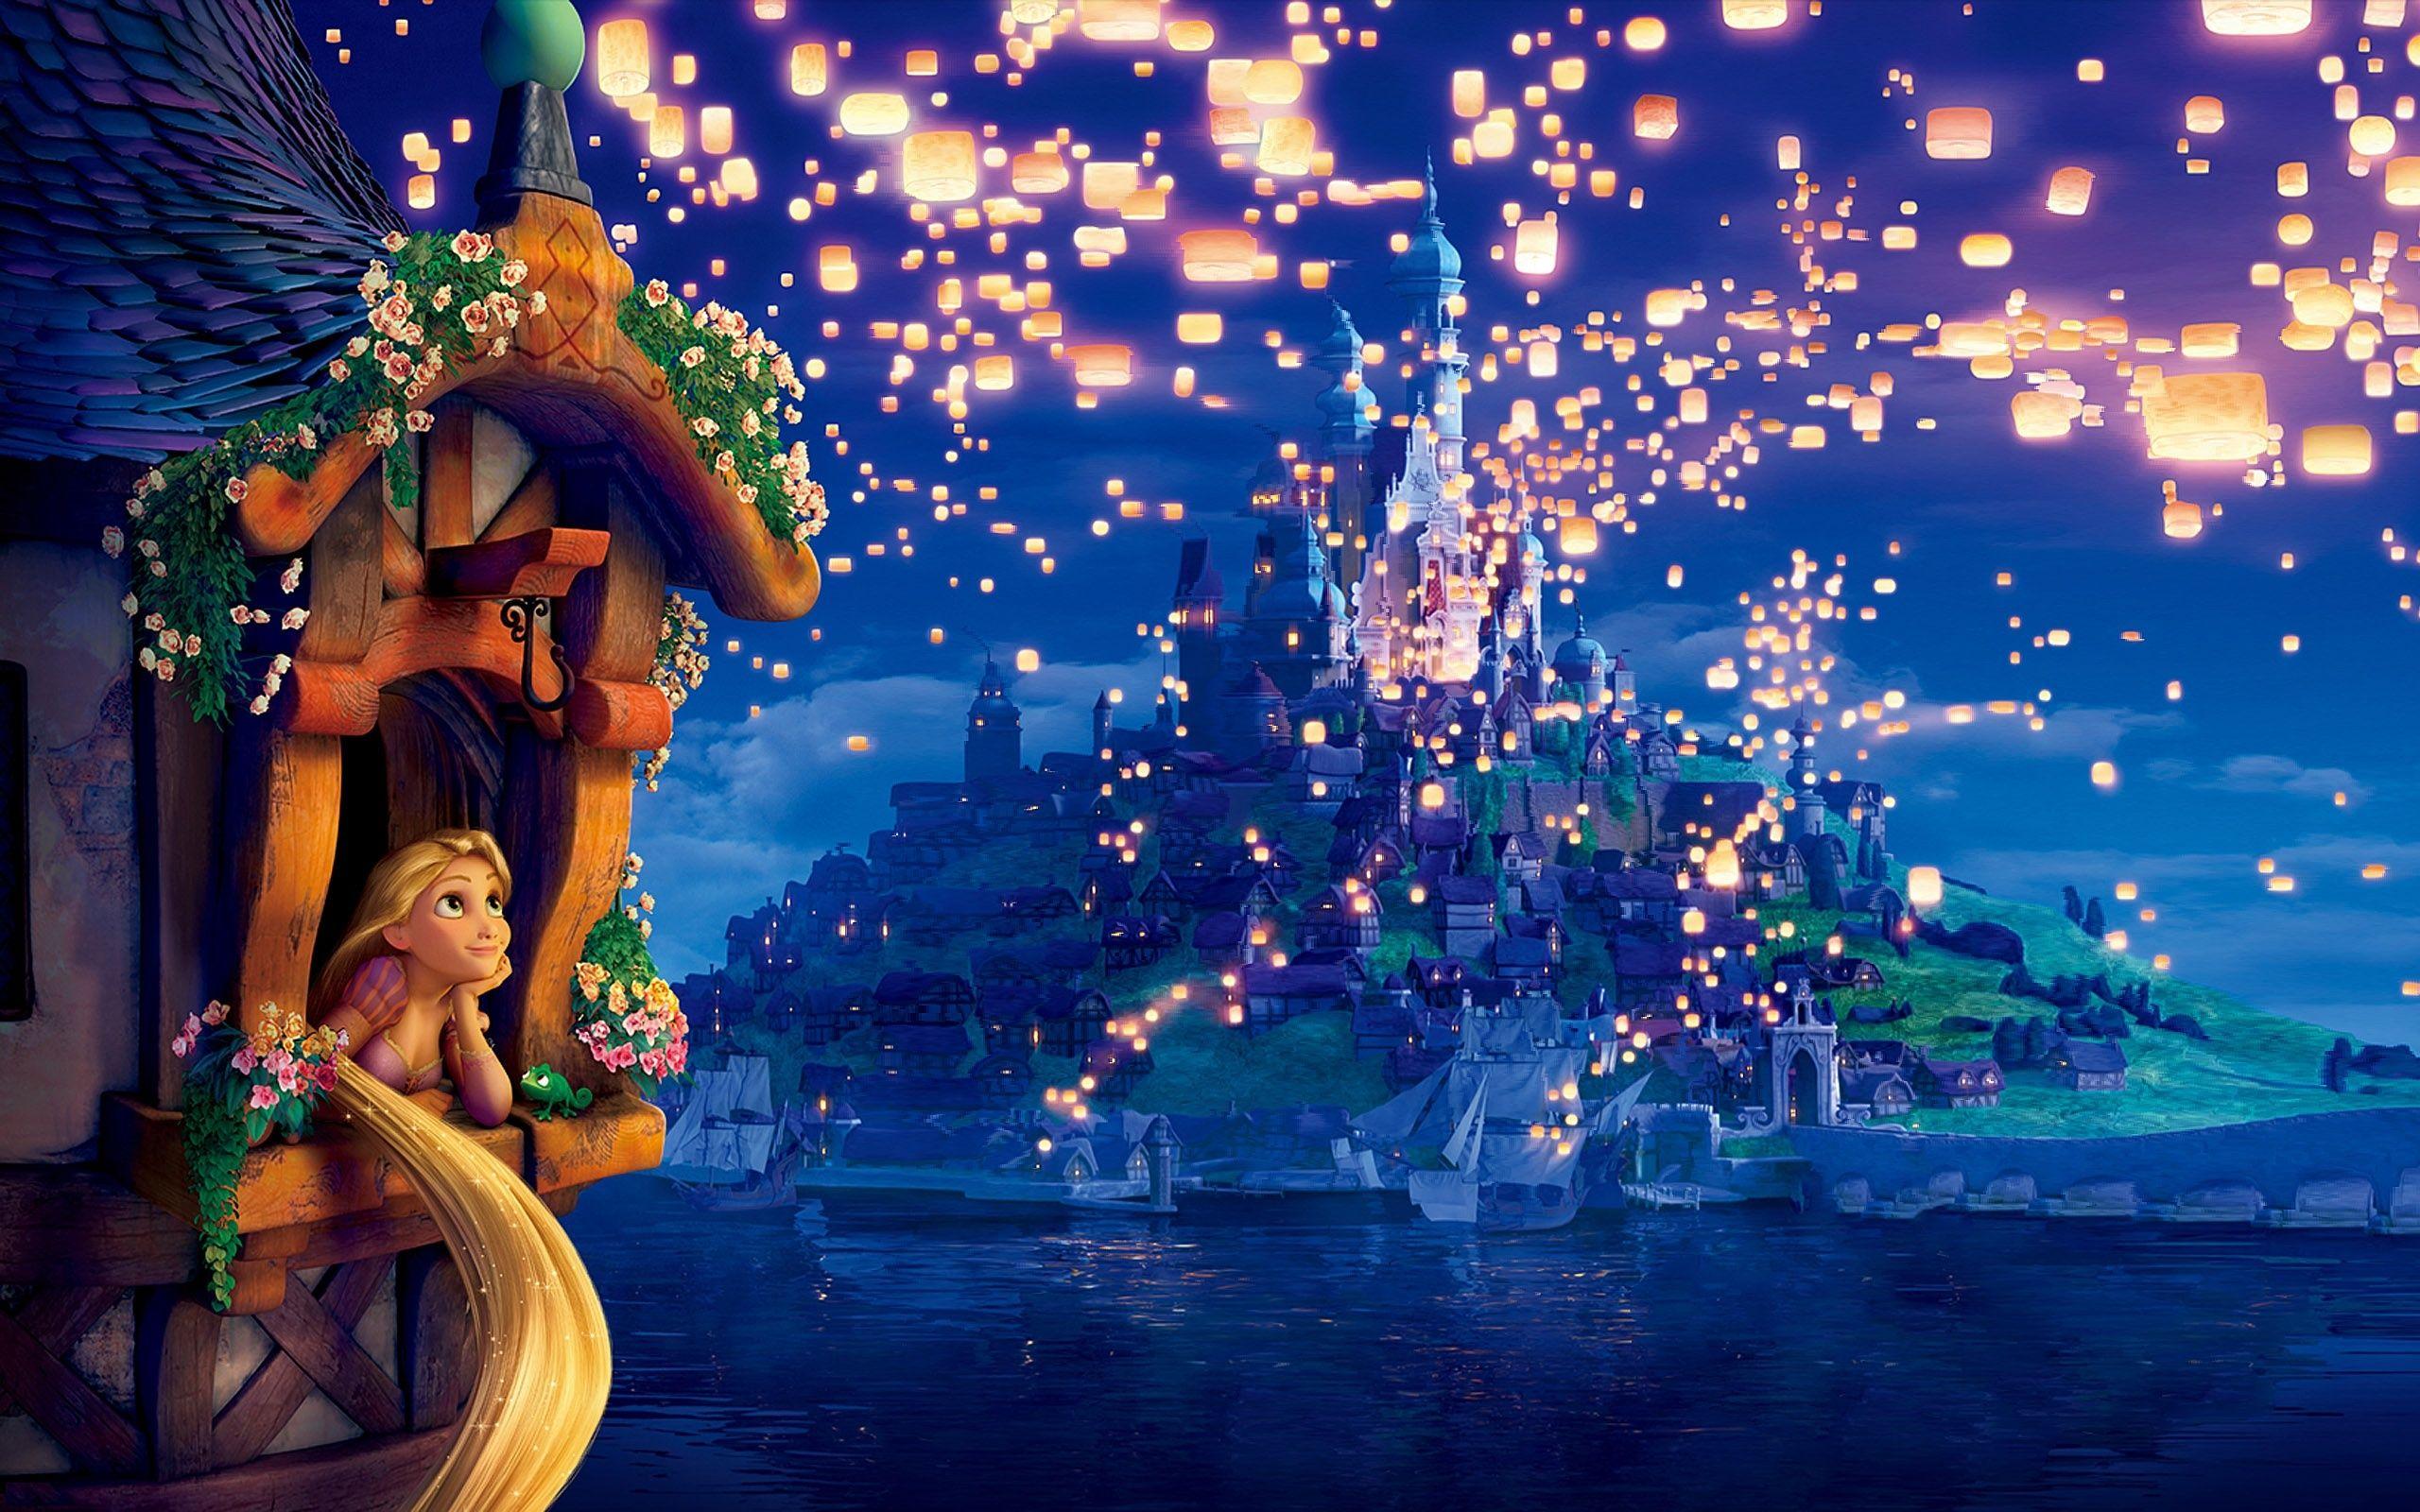 Tangled The Movie Rapunzel Princess Dreams Lanterns Lights Night Evening Tangled Rapunzel Princess An Disney Background Kinkade Disney Disney Desktop Wallpaper